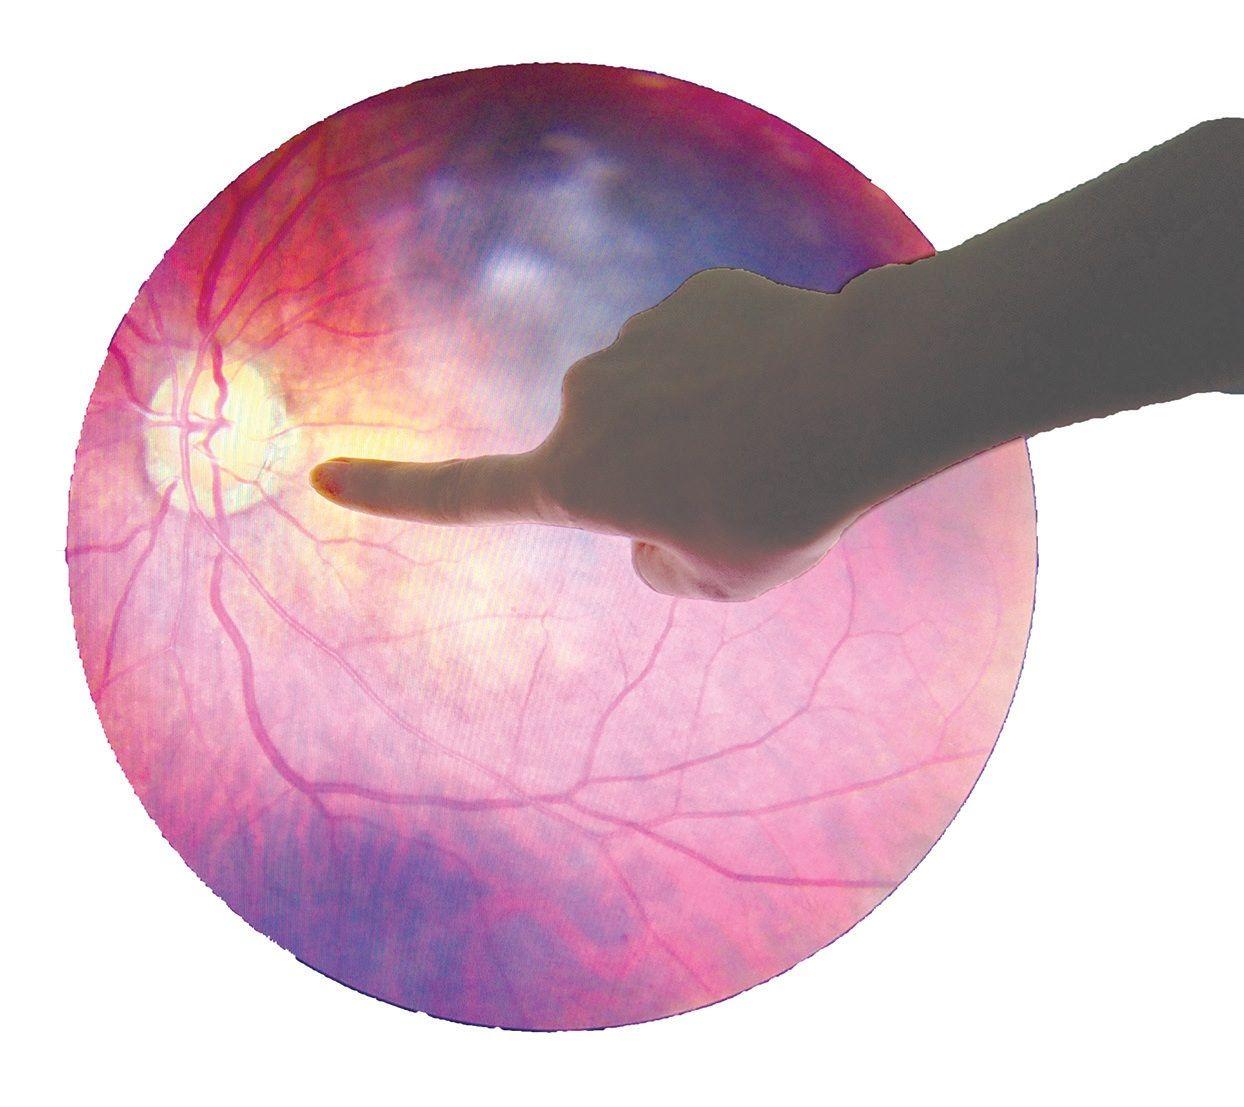 Ochiul diabetic te poate orbi. Ireversibil